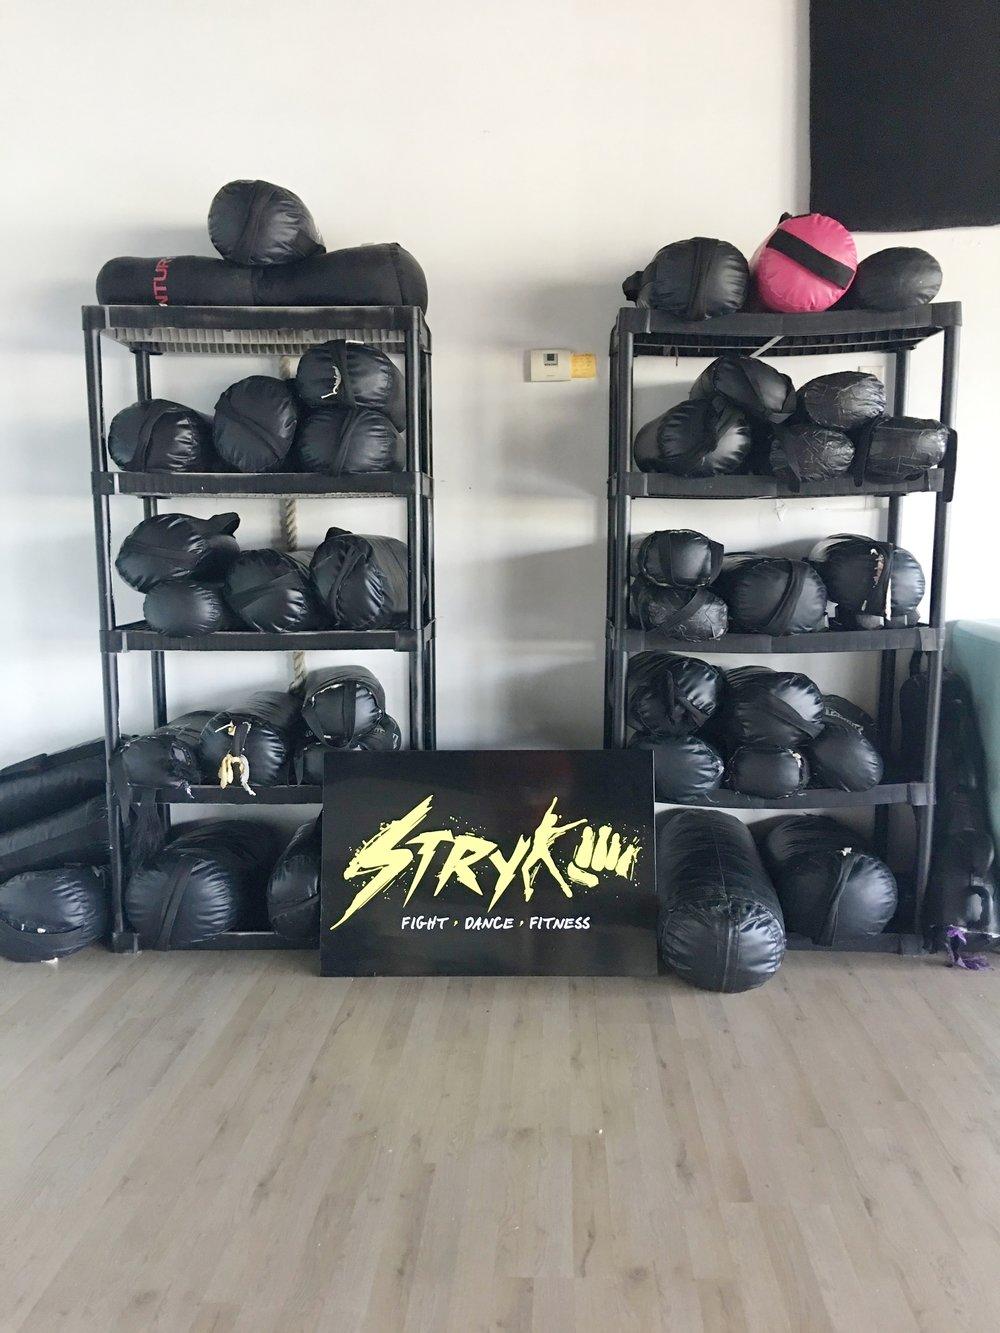 Stryke Fitness Studio Charleston SC Fight Dance Fitness Workout.JPG